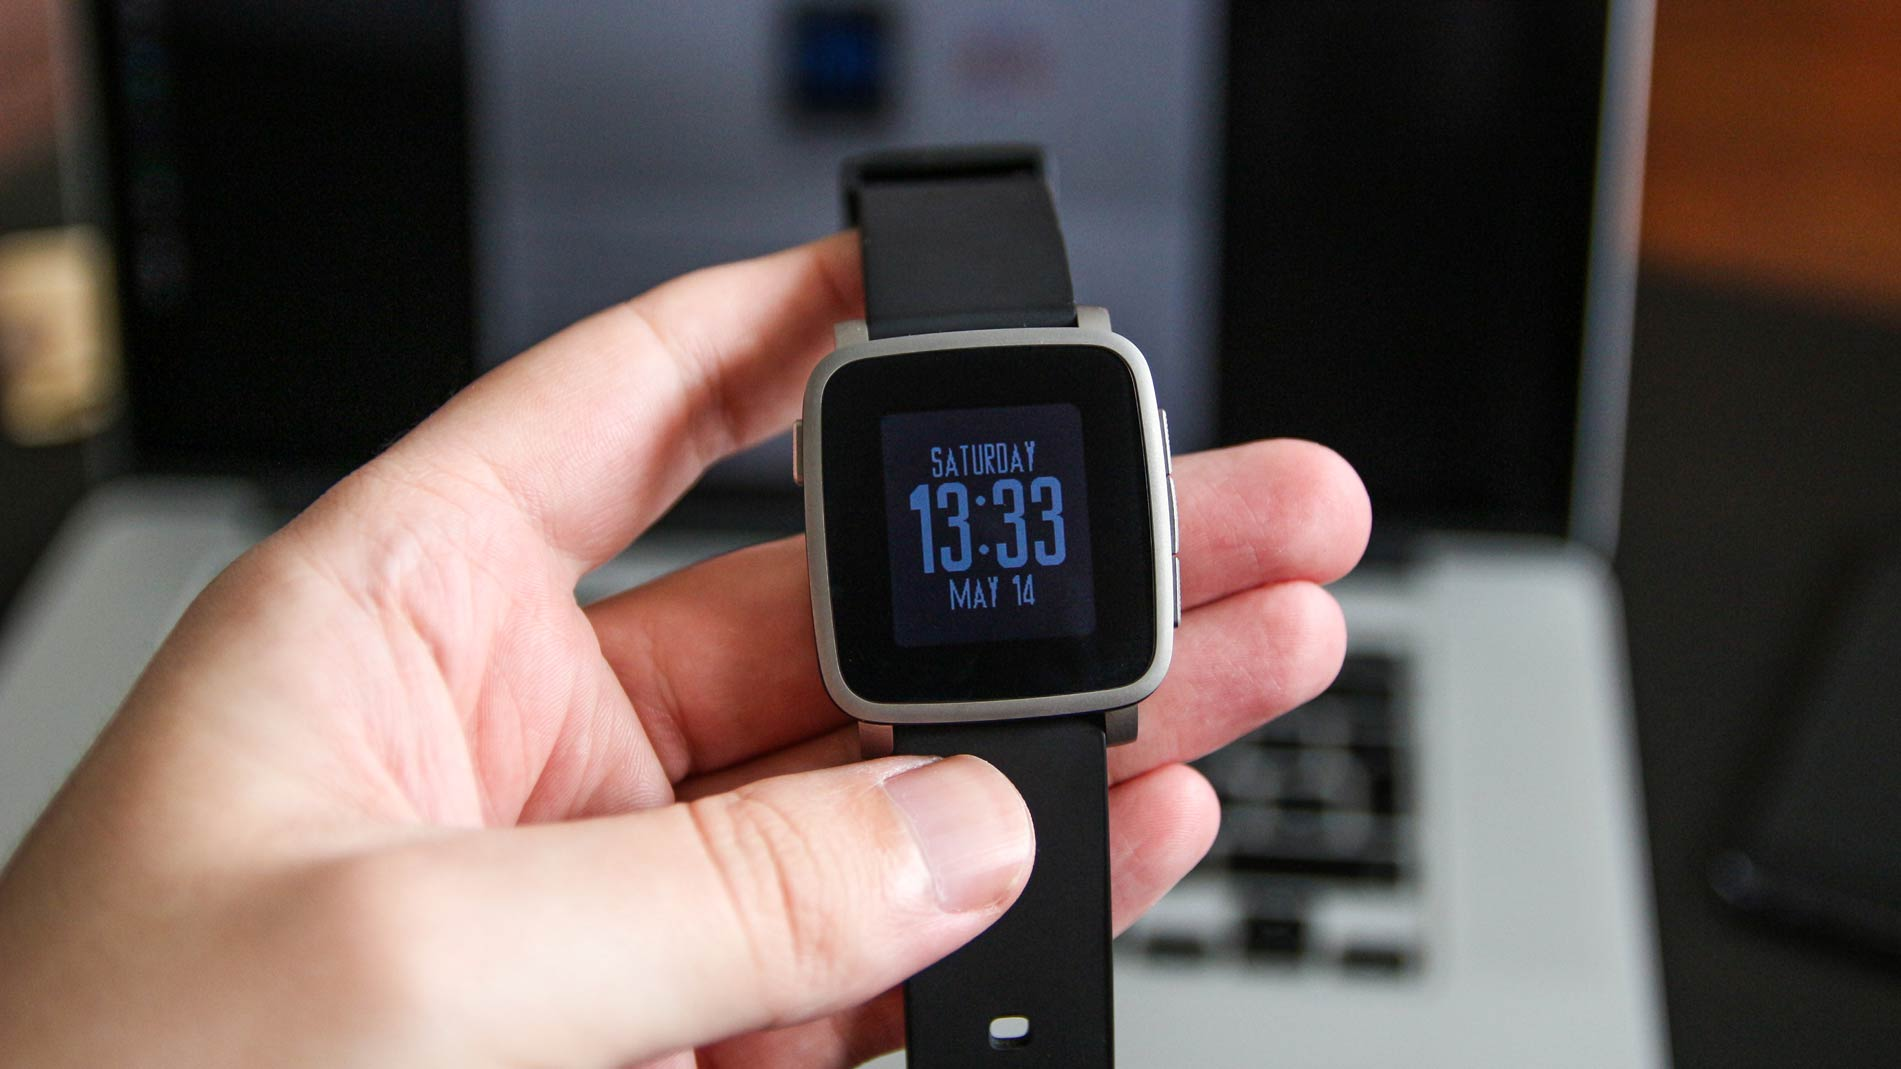 Best Watchfaces for Pebble Time - Blue Futuristic